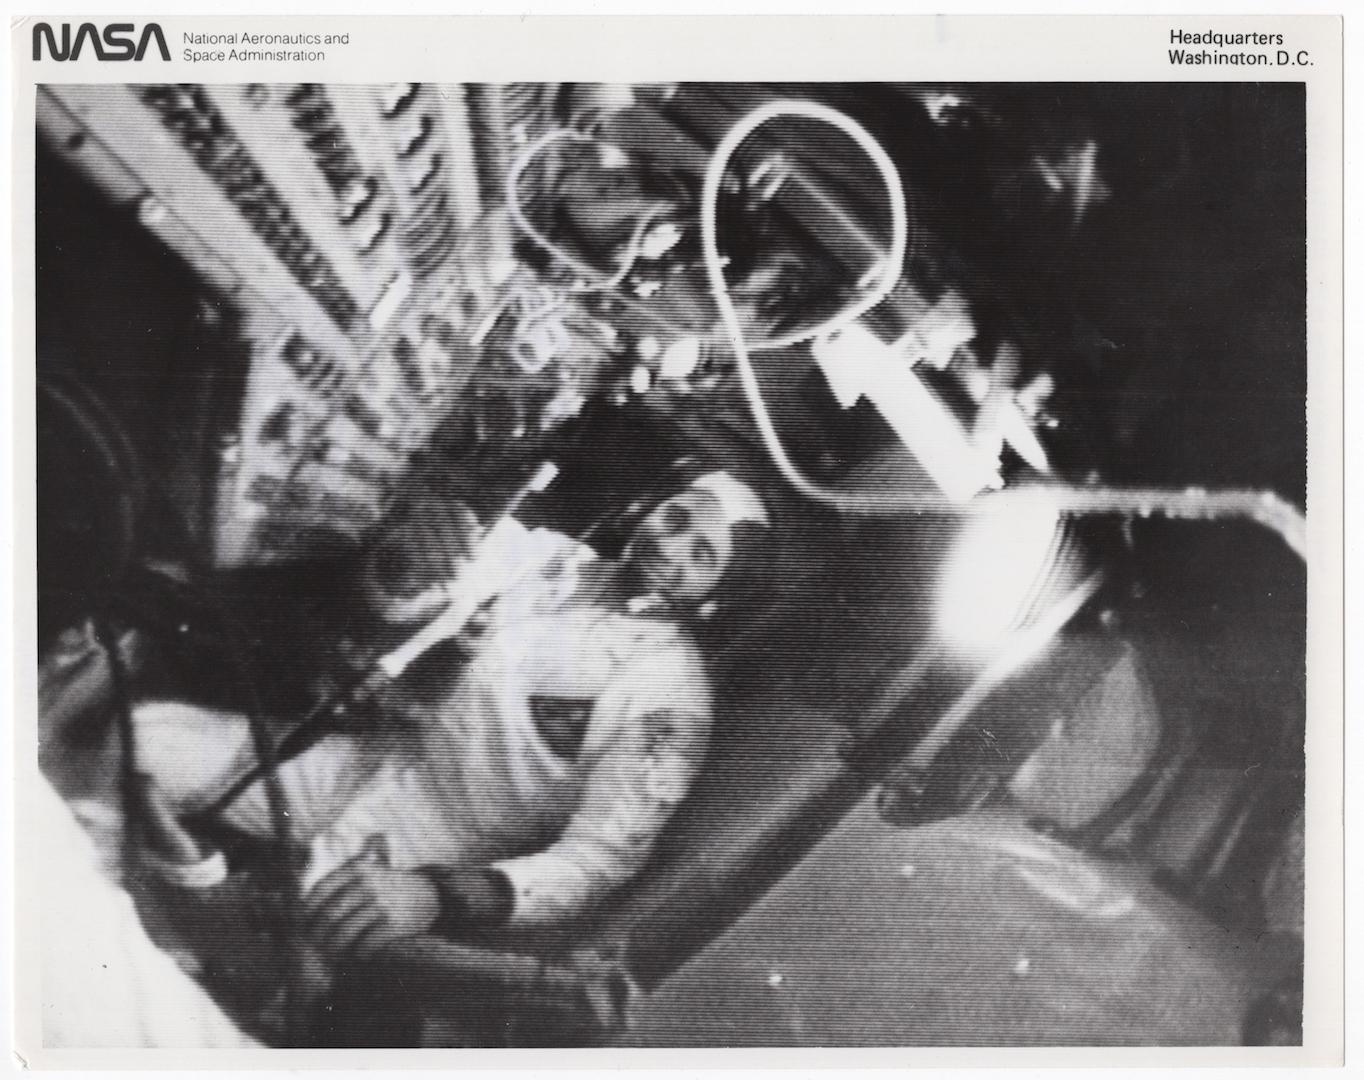 ERM-1968-PHOTO-68HI1404-FRONT.jpg